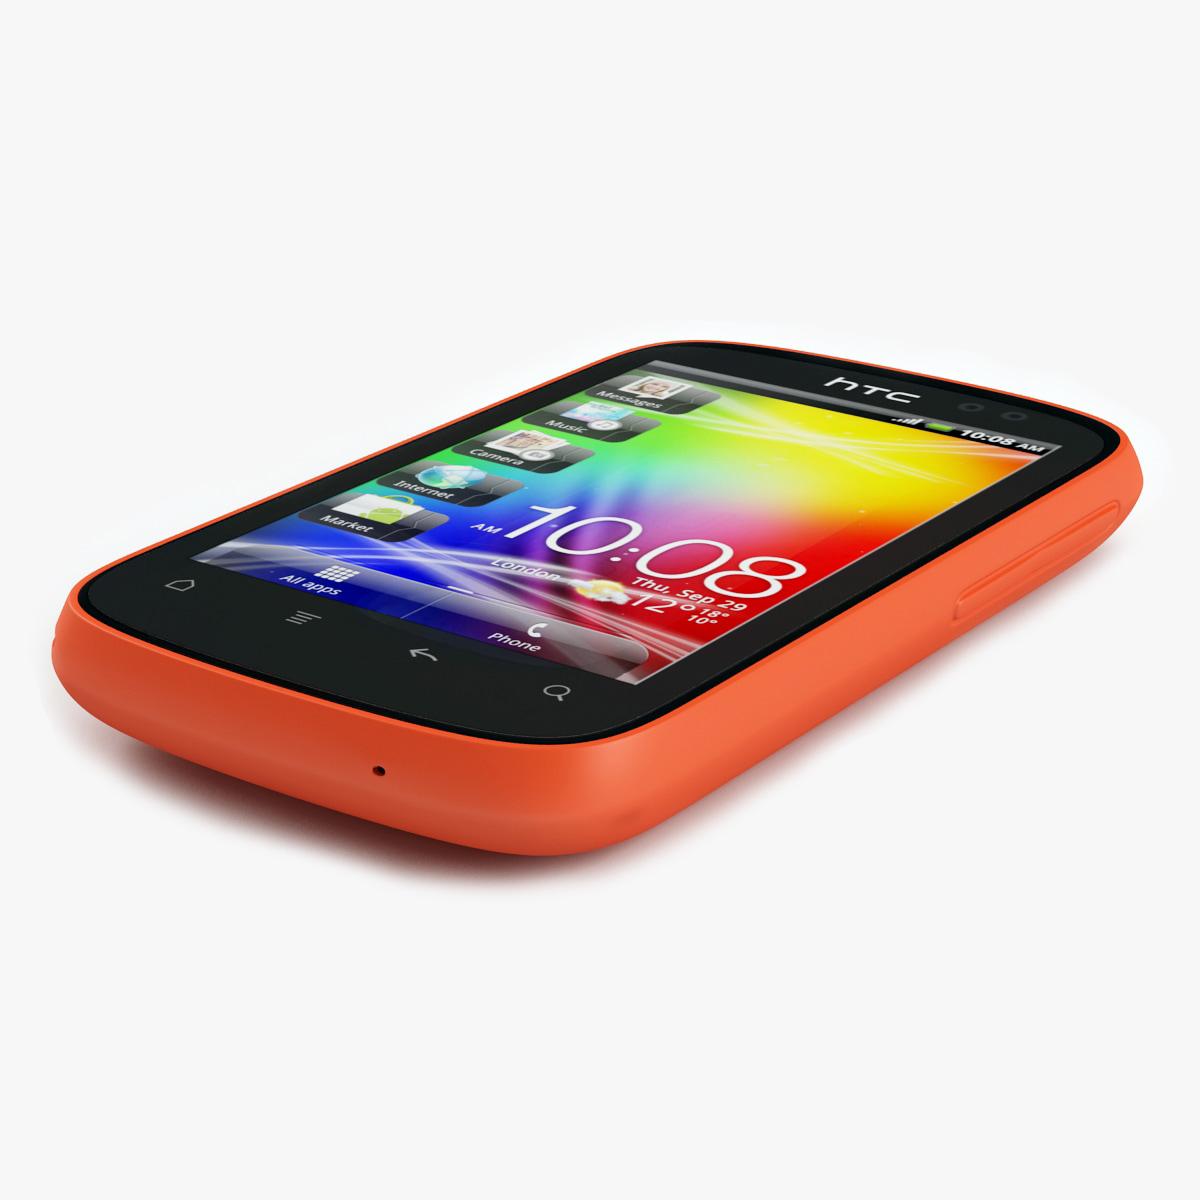 Htc_Explorer_Orange_00.jpg